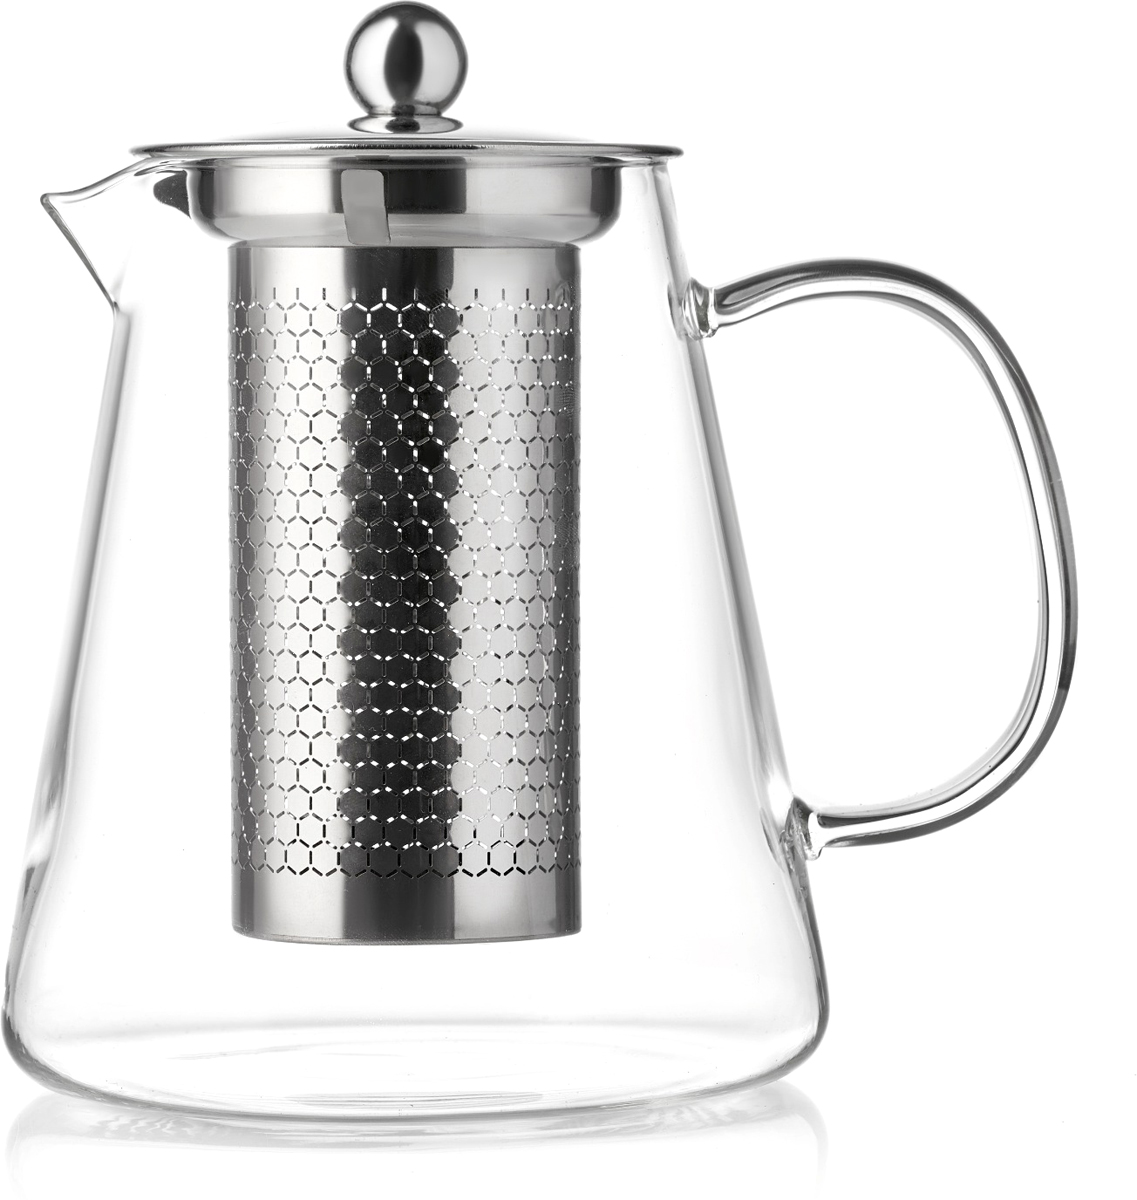 Чайник заварочный Walmer Sapphire, цвет: прозрачный, 1 л заварочный чайник seong hoo dang